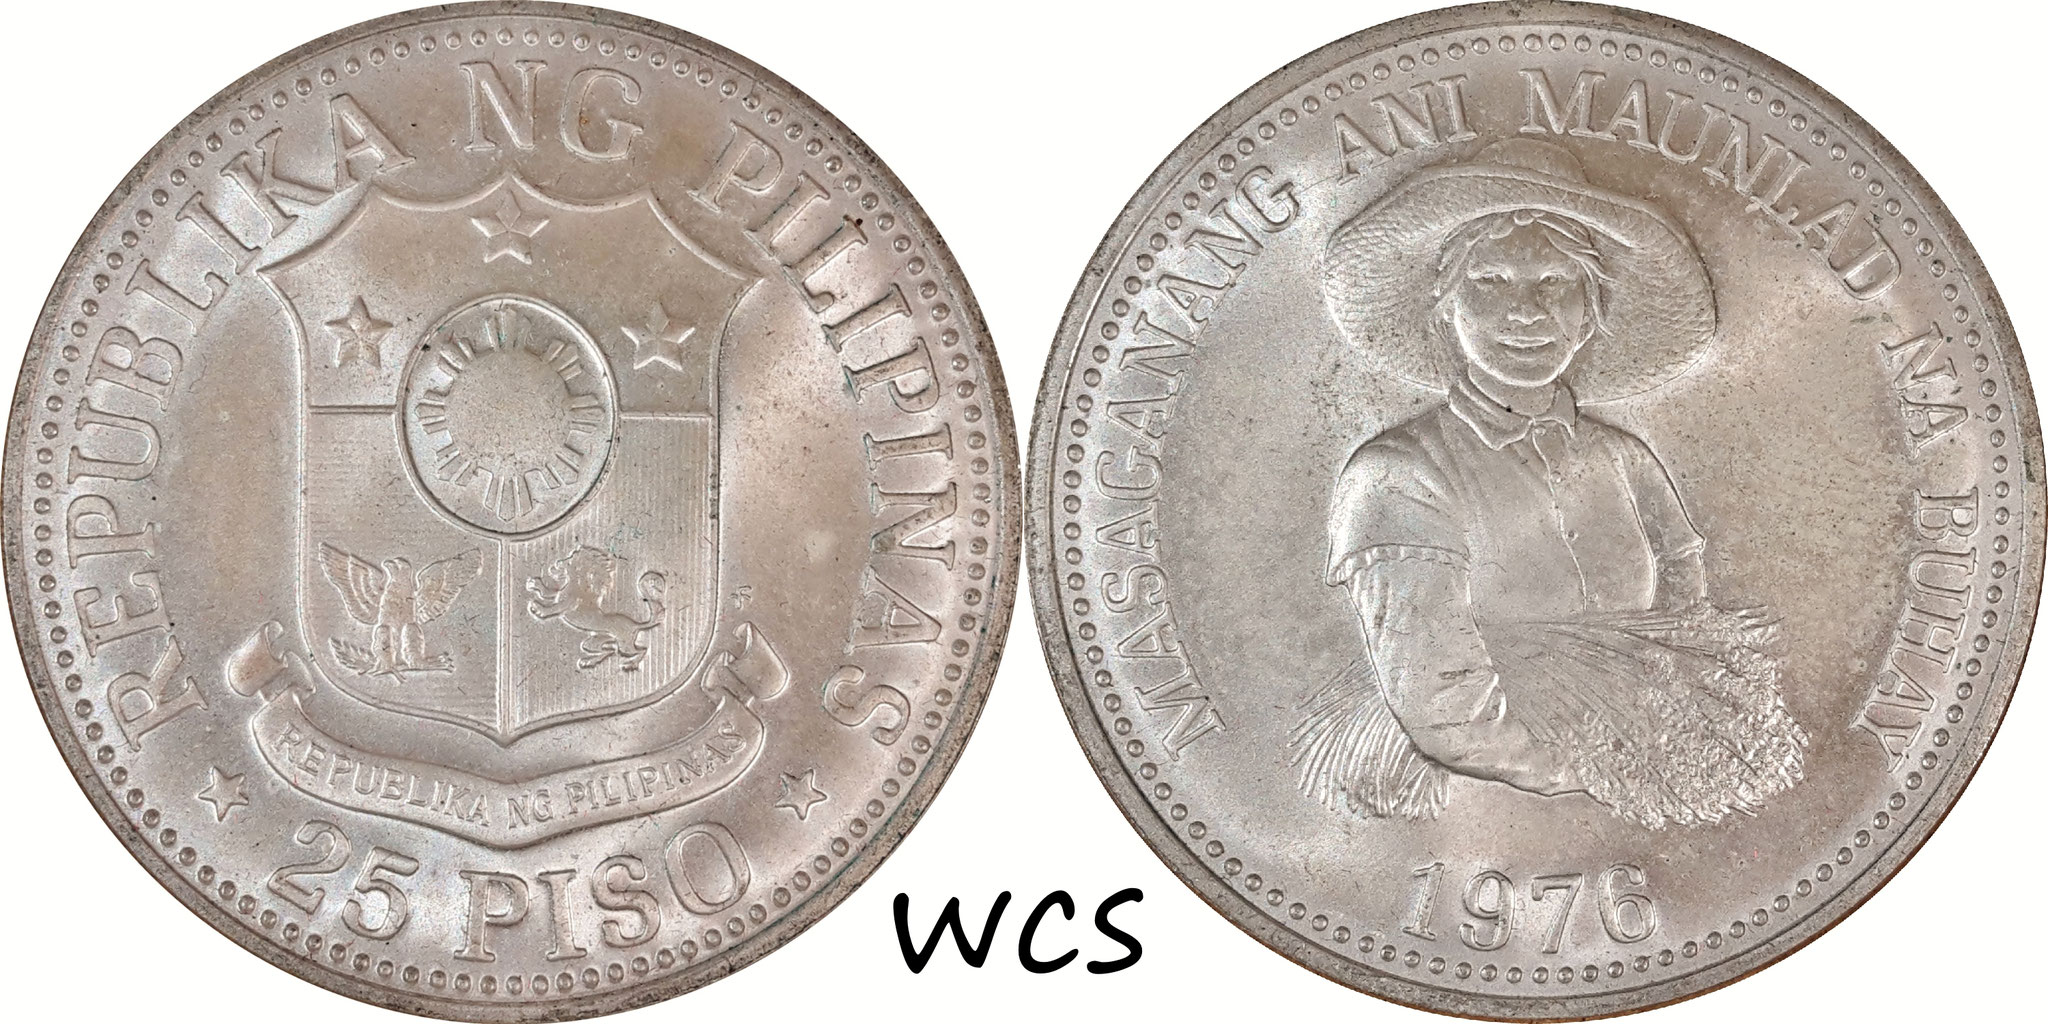 Philippines 25 Piso 1976  - F.A.O.